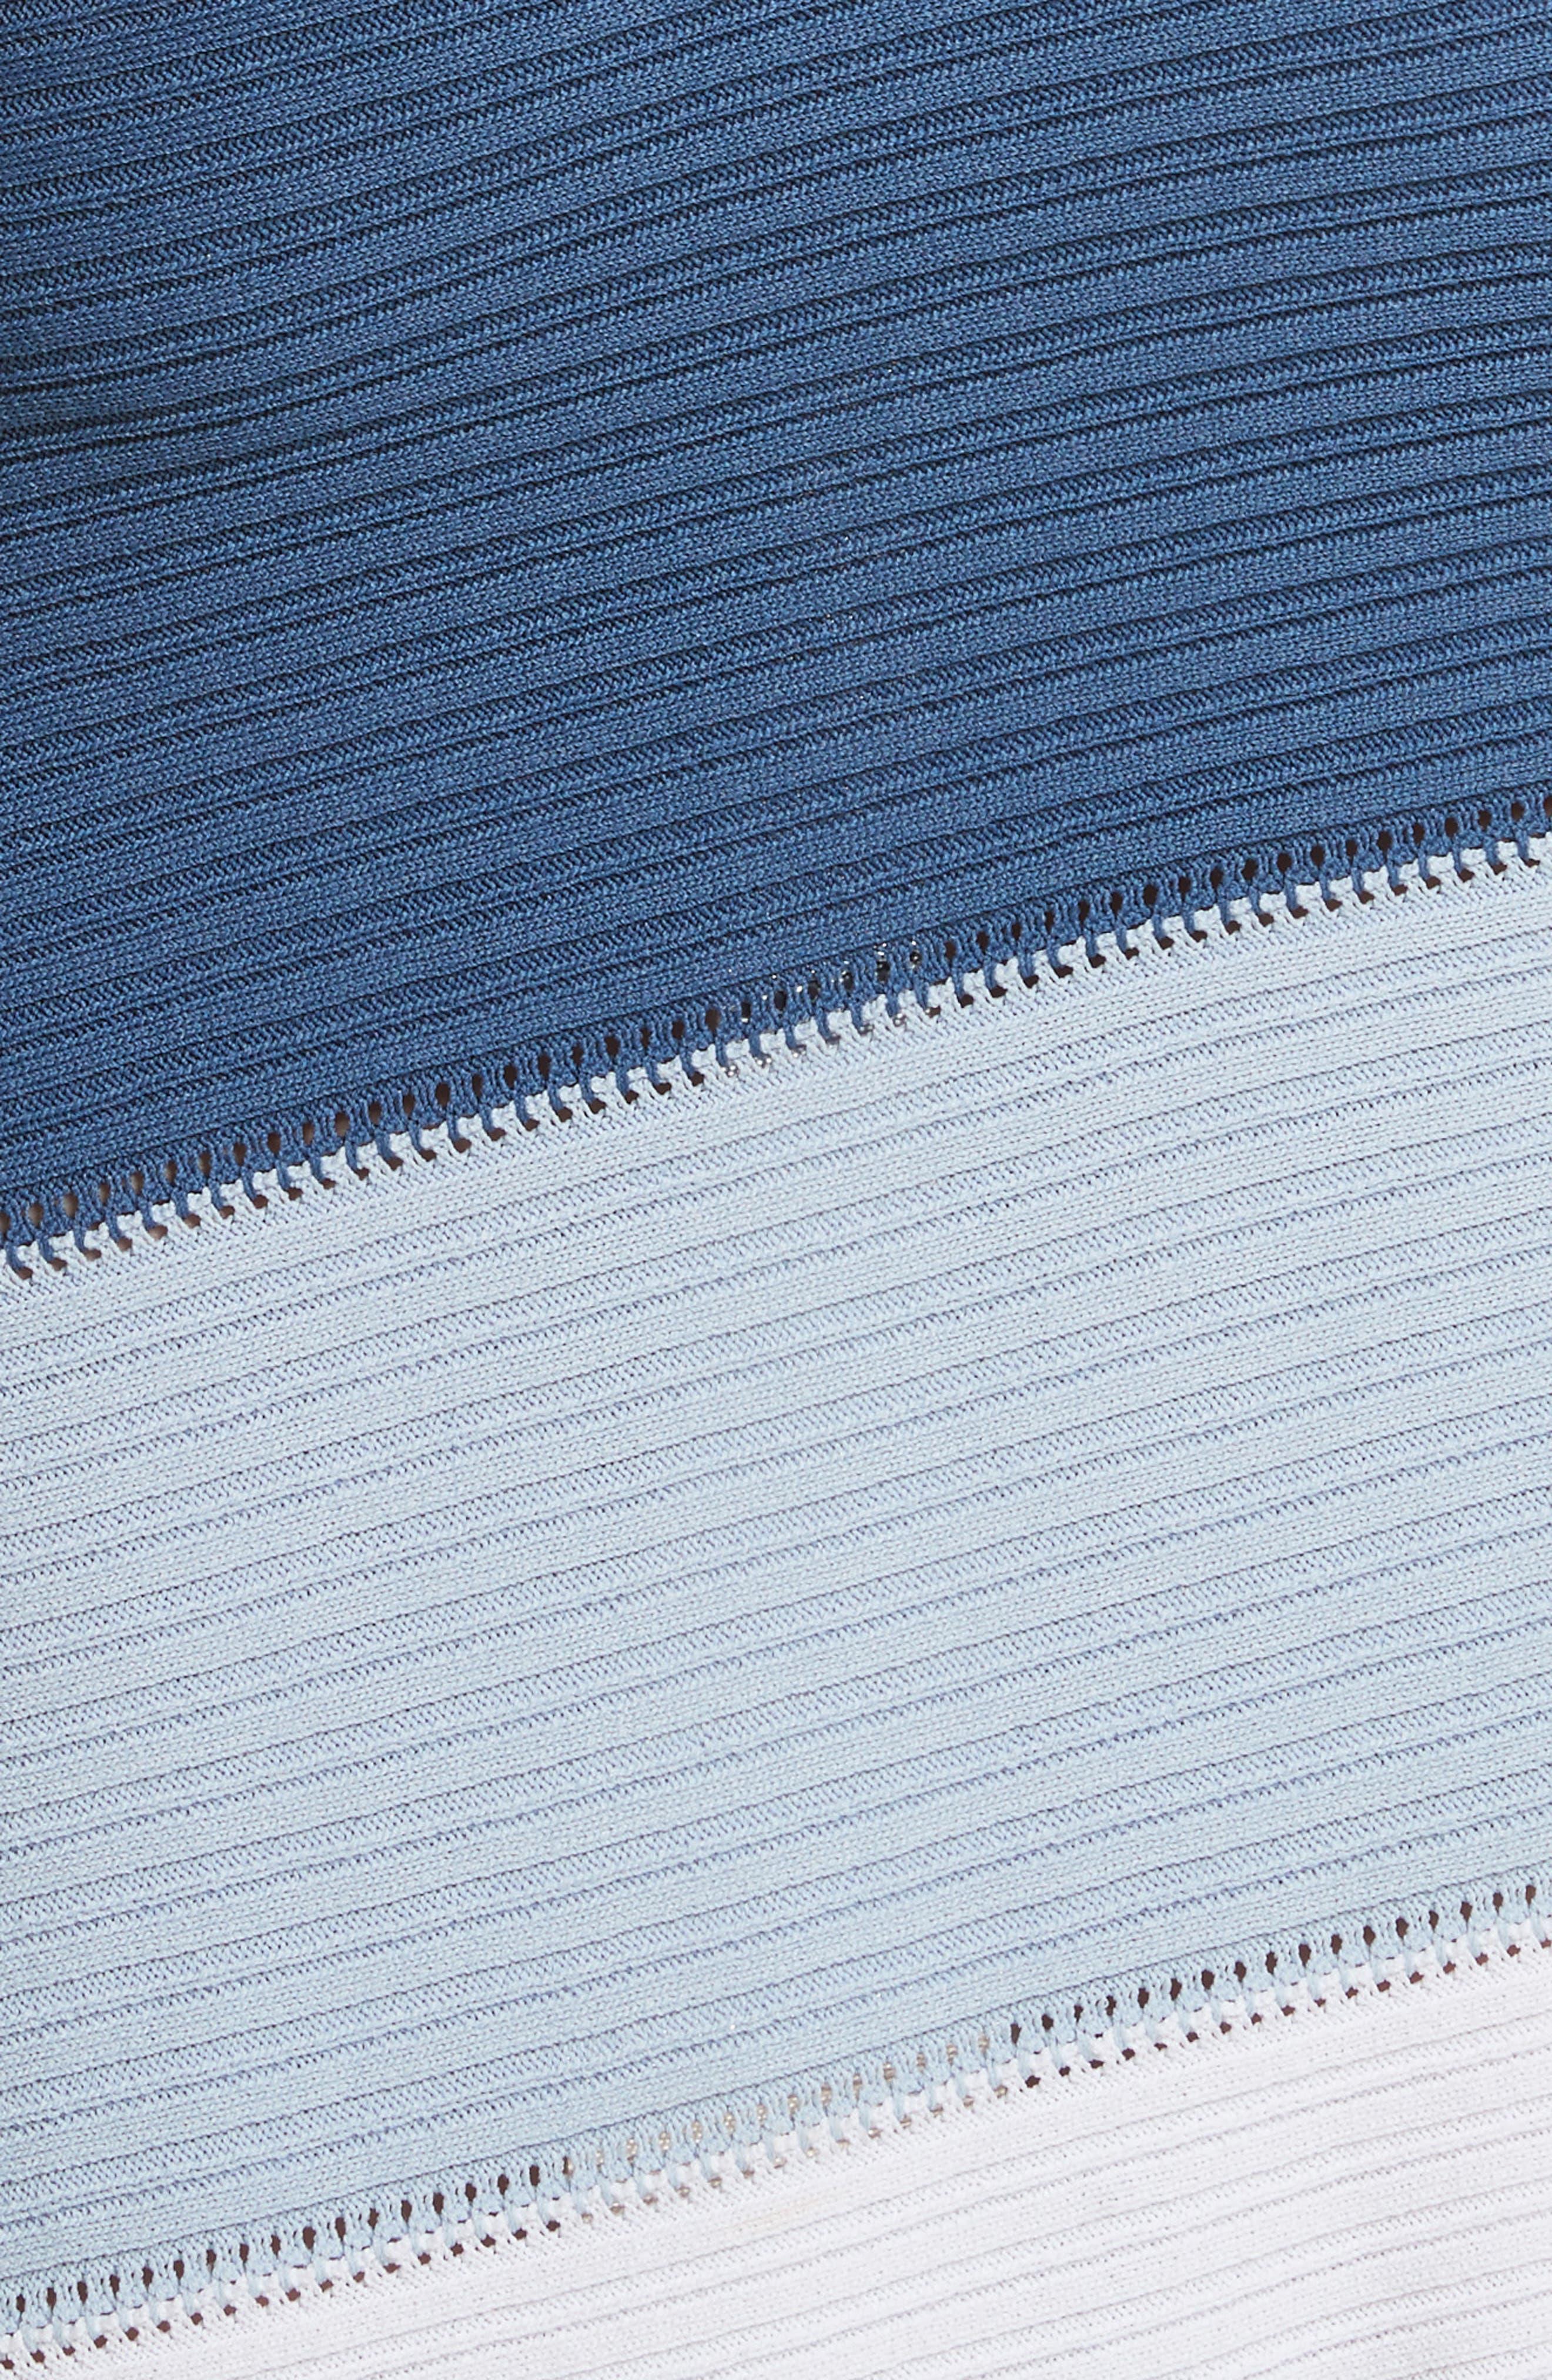 Linked Asymmetrical Dress,                             Alternate thumbnail 5, color,                             Blue Combo